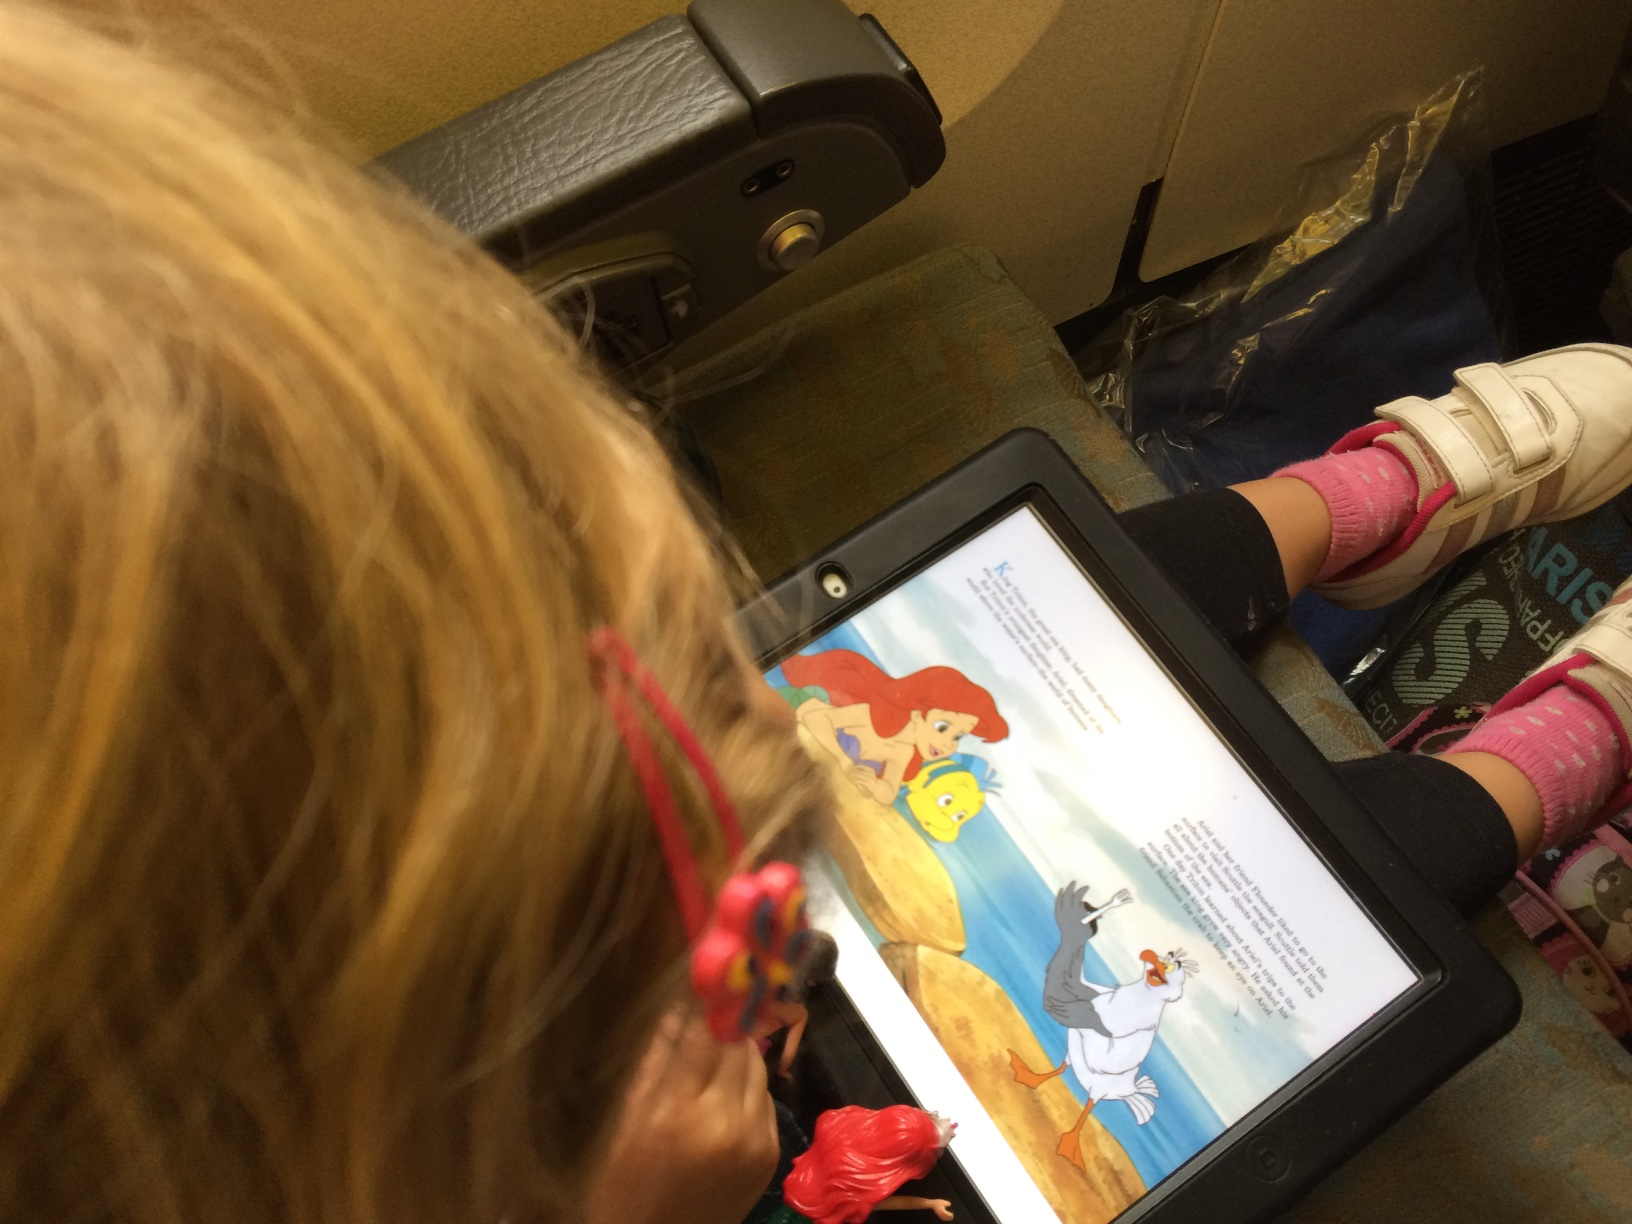 Reading The Little Mermaid